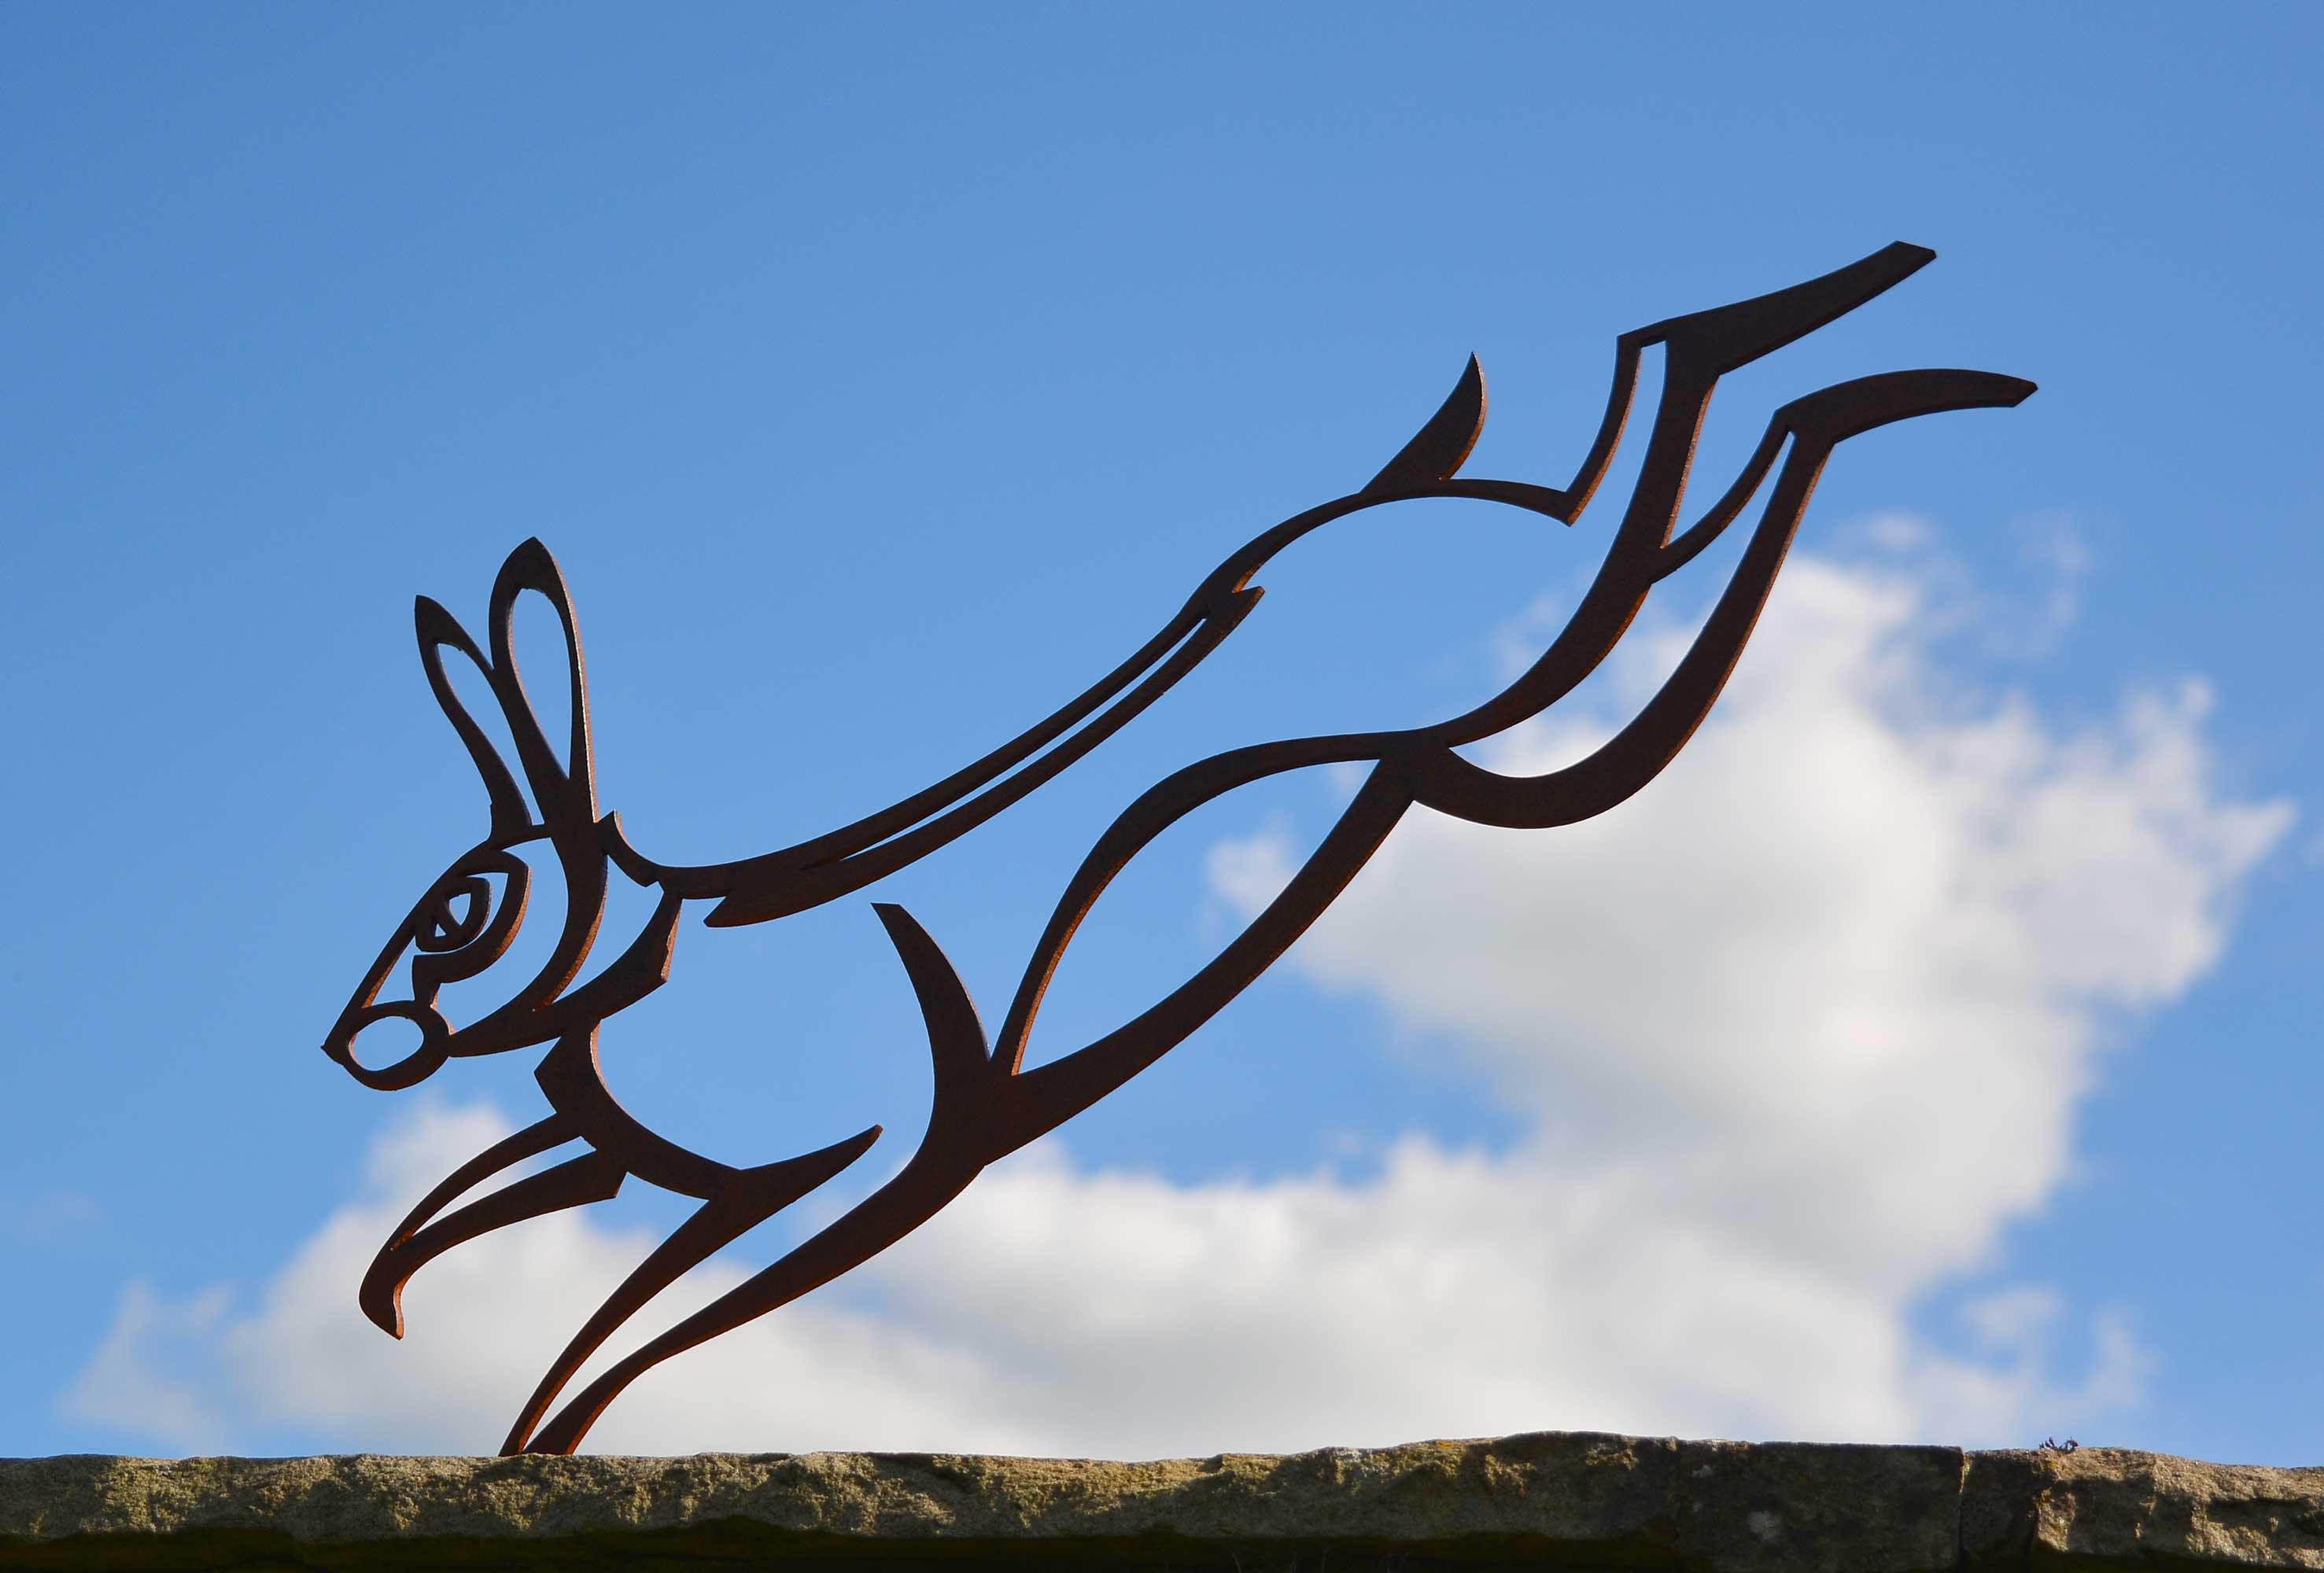 Hare sculpture against blue sky